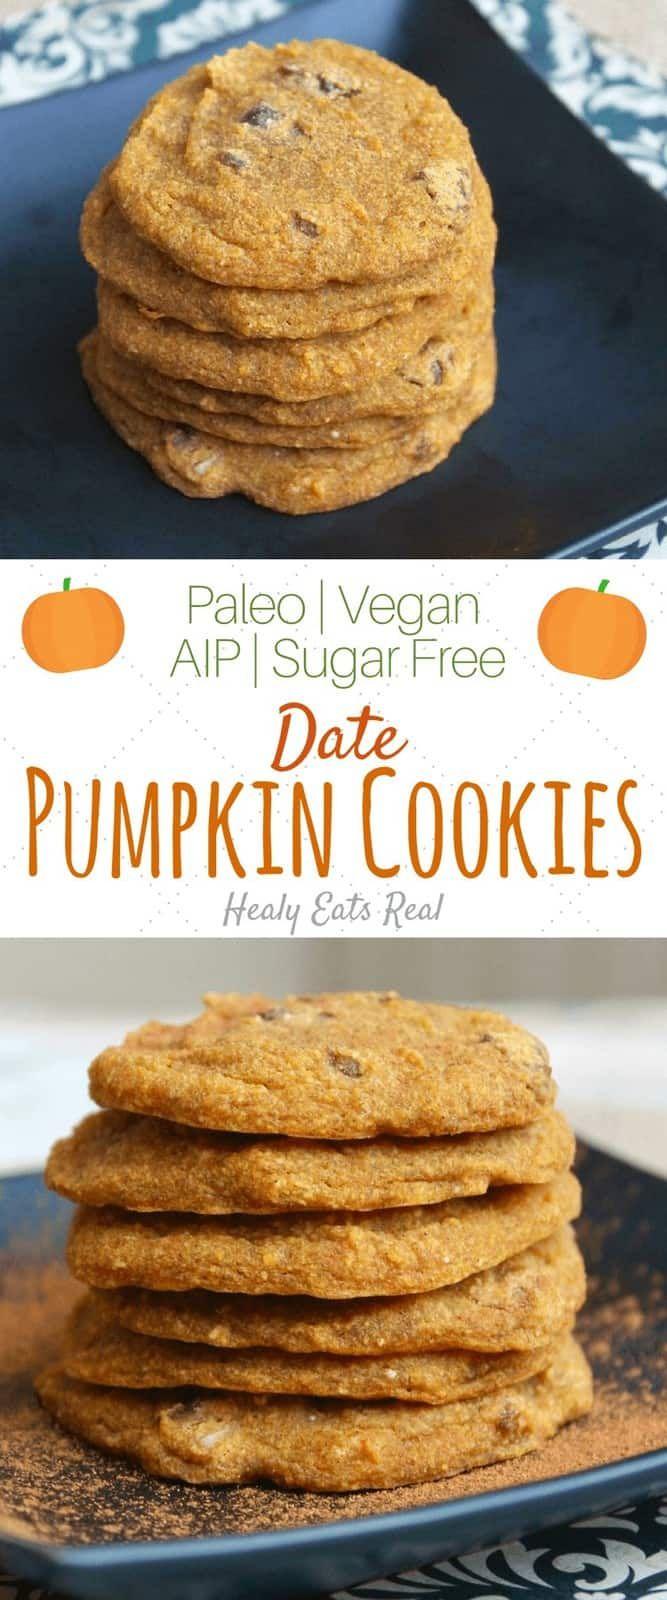 Healthy Banana Pumpkin Cookies Aip Paleo Vegan Sugar Free